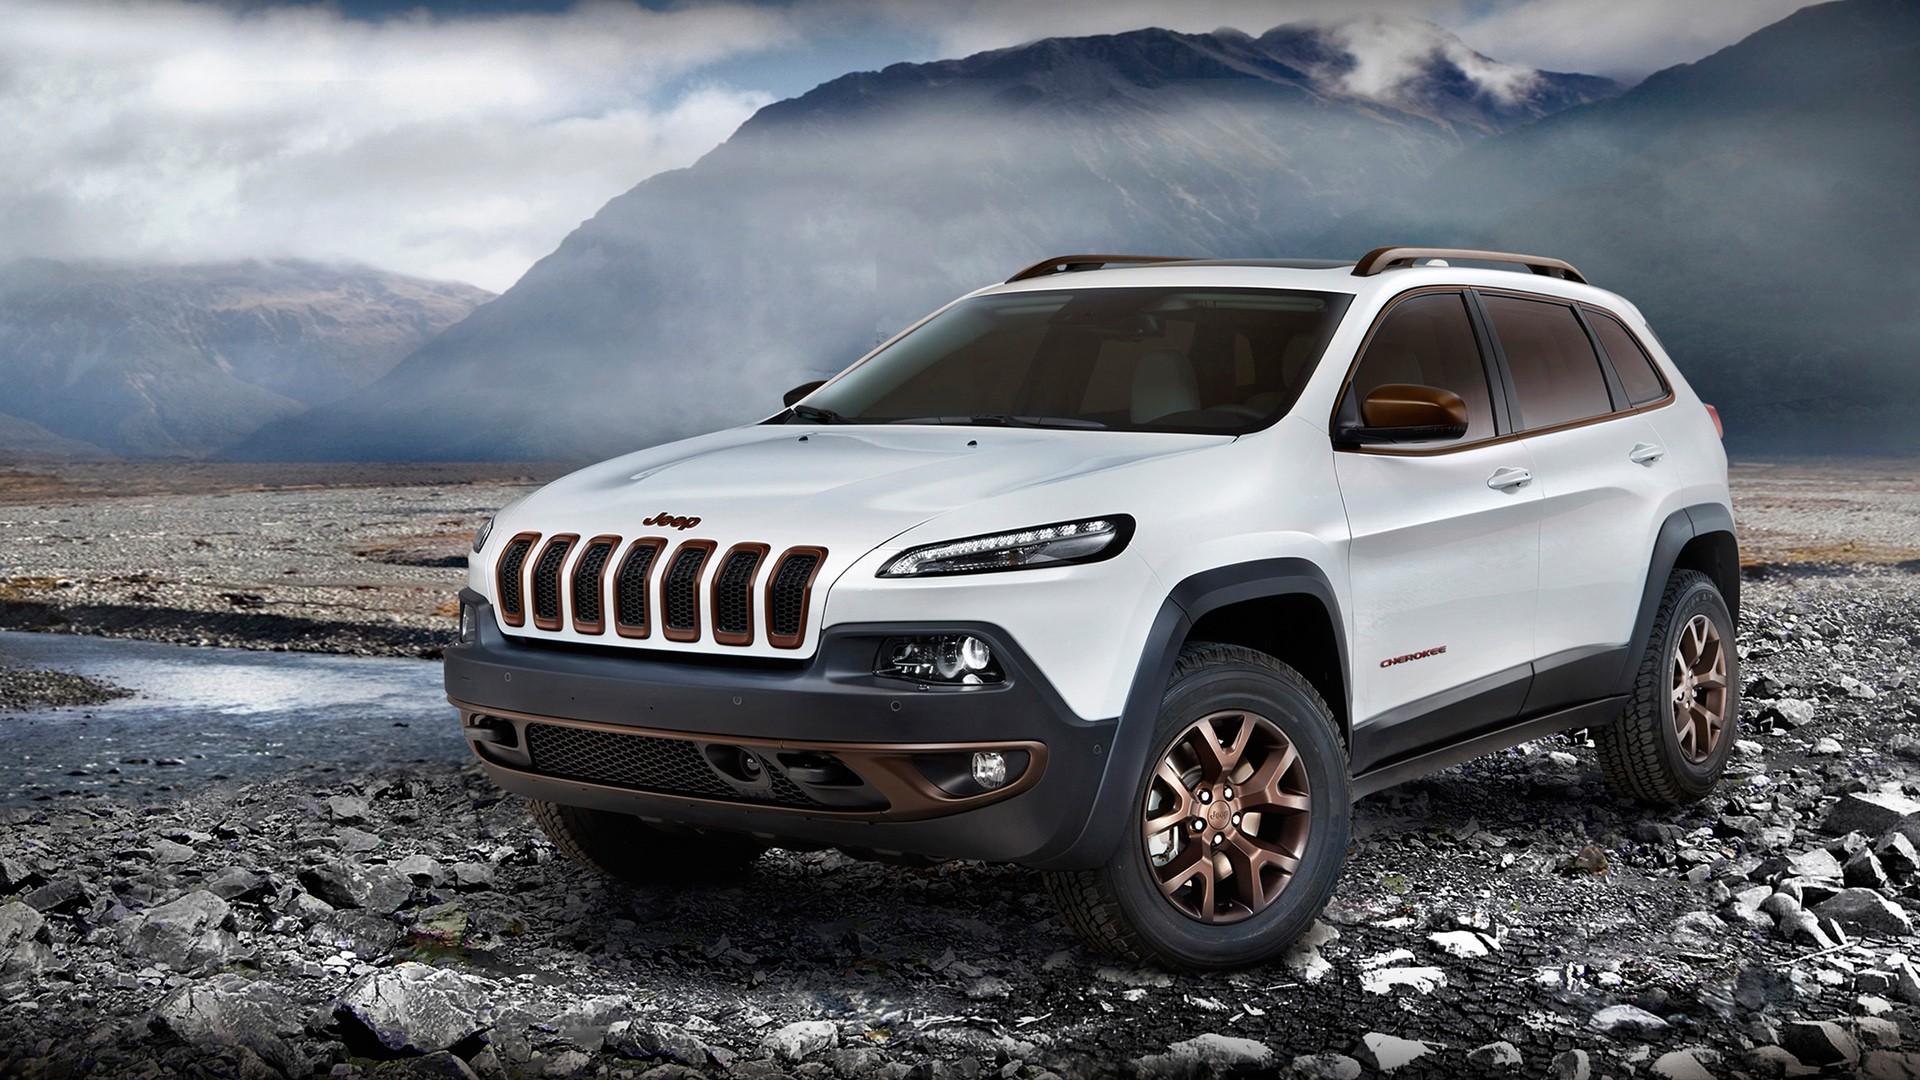 2014 Jeep Cherokee Sageland Concept Wallpaper | HD Car Wallpapers | ID #4421